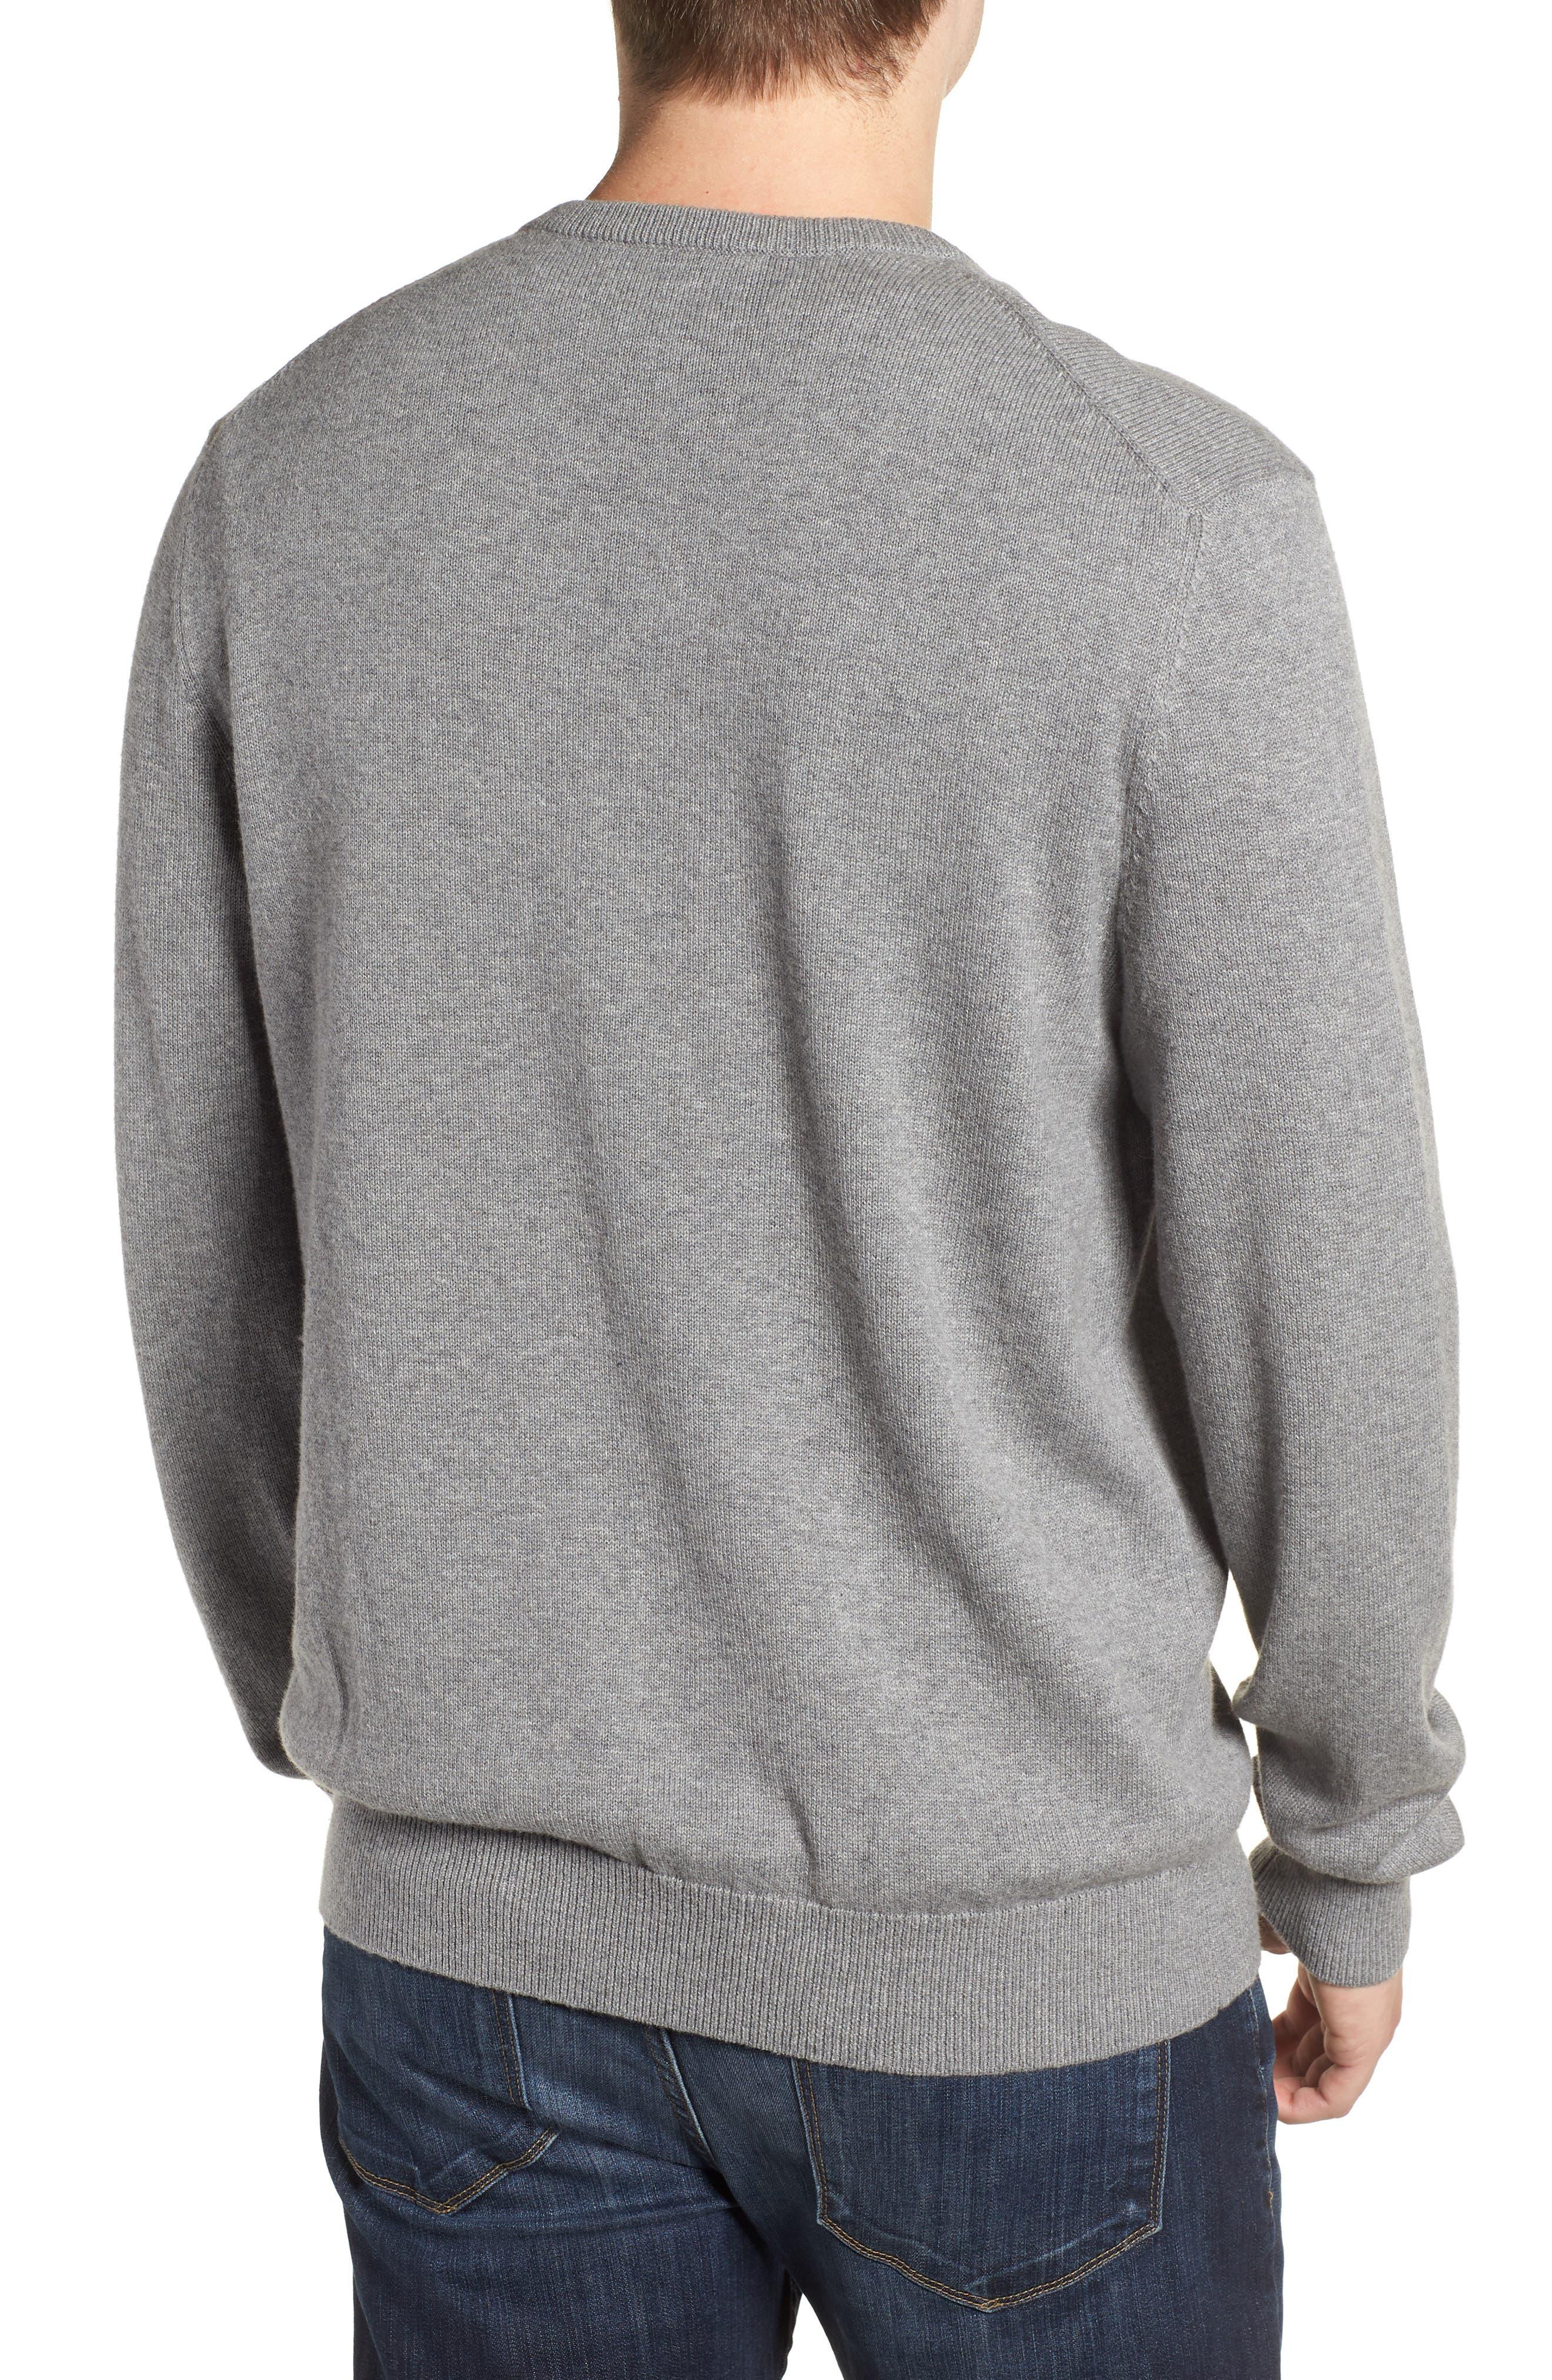 Cotton & Cashmere V-Neck Sweater,                             Alternate thumbnail 2, color,                             GRAY HEATHER